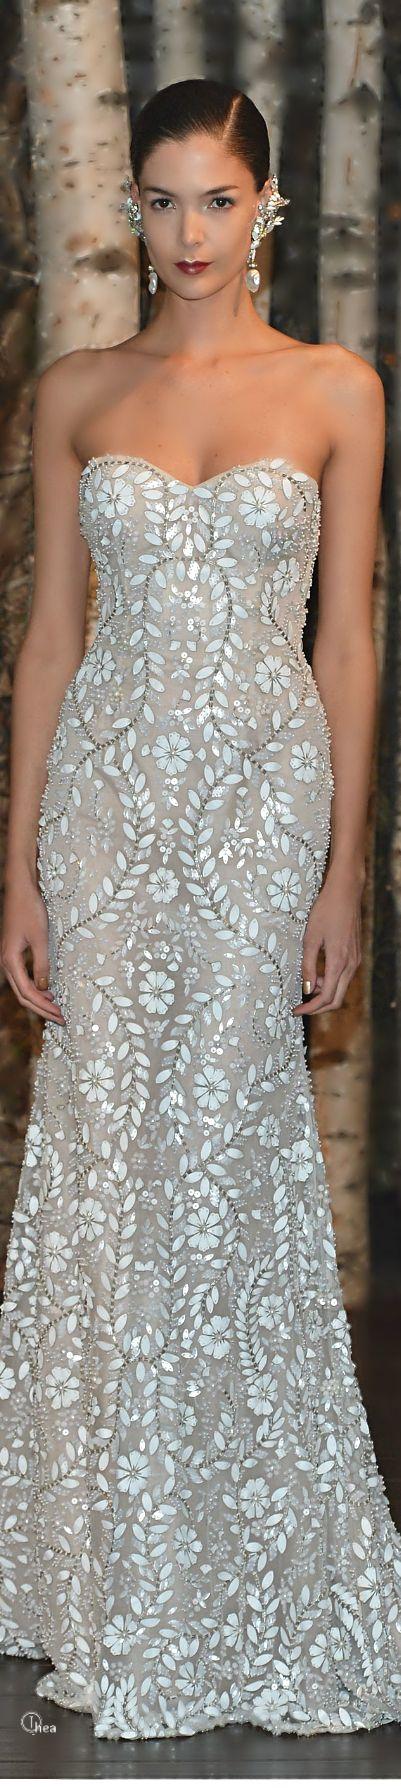 White and Gold Wedding. Gold Bridesmaid Dress. Soft and Romantic. Naeem Khan Bridal ● Spring 2015